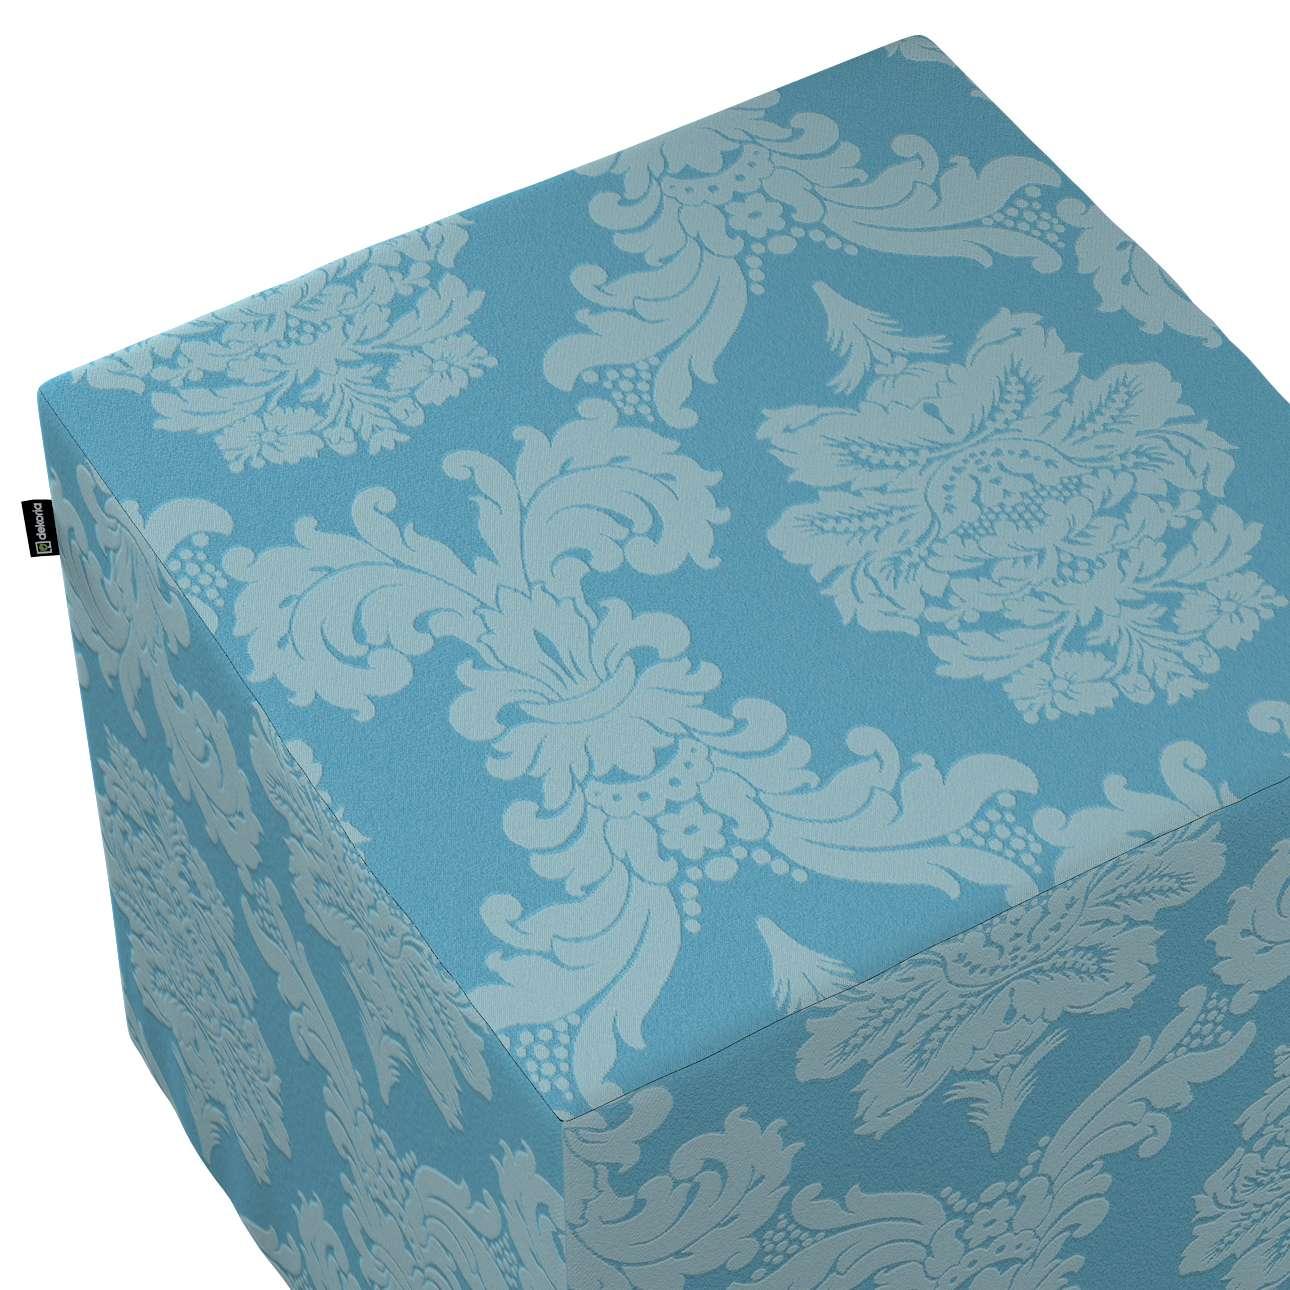 Sedák Cube - kostka pevná 40x40x40 v kolekci Damasco, látka: 613-67